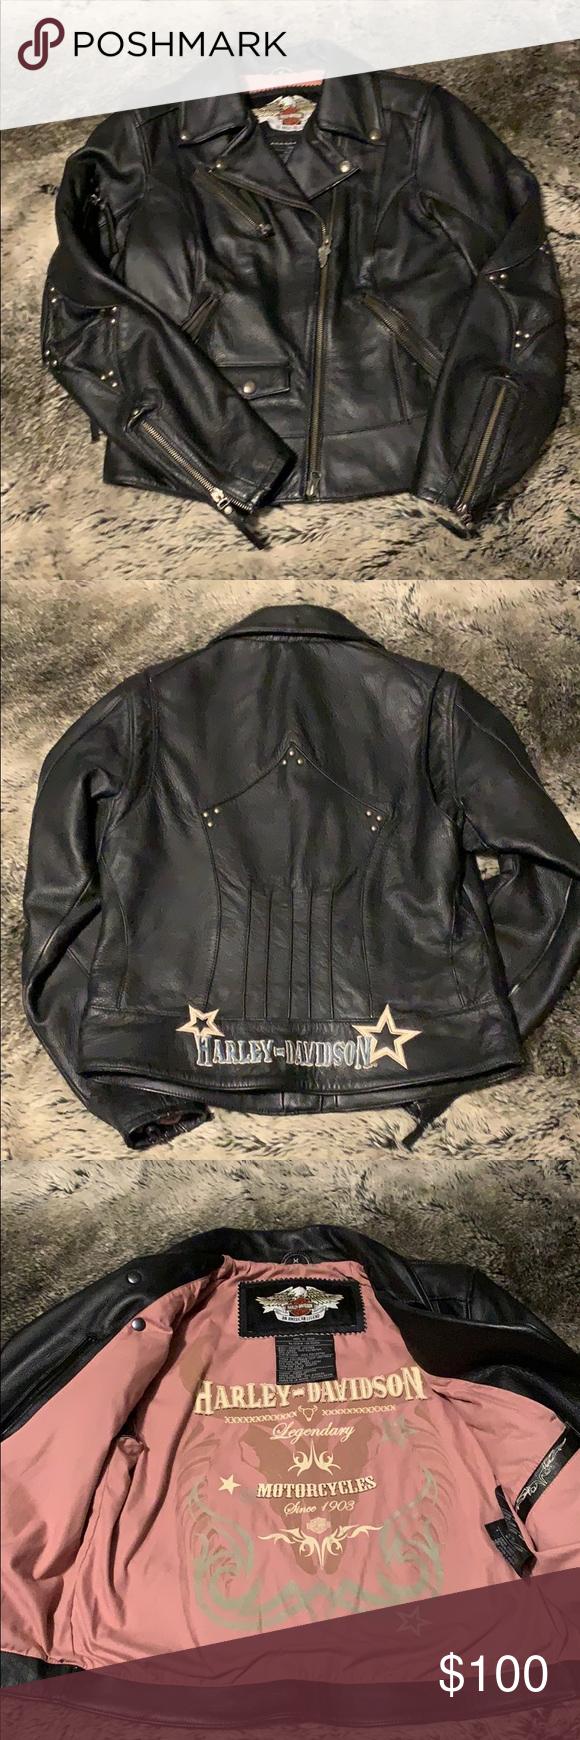 Hd Leather Jacket Leather Jacket Beautiful Jacket Jackets [ 1740 x 580 Pixel ]